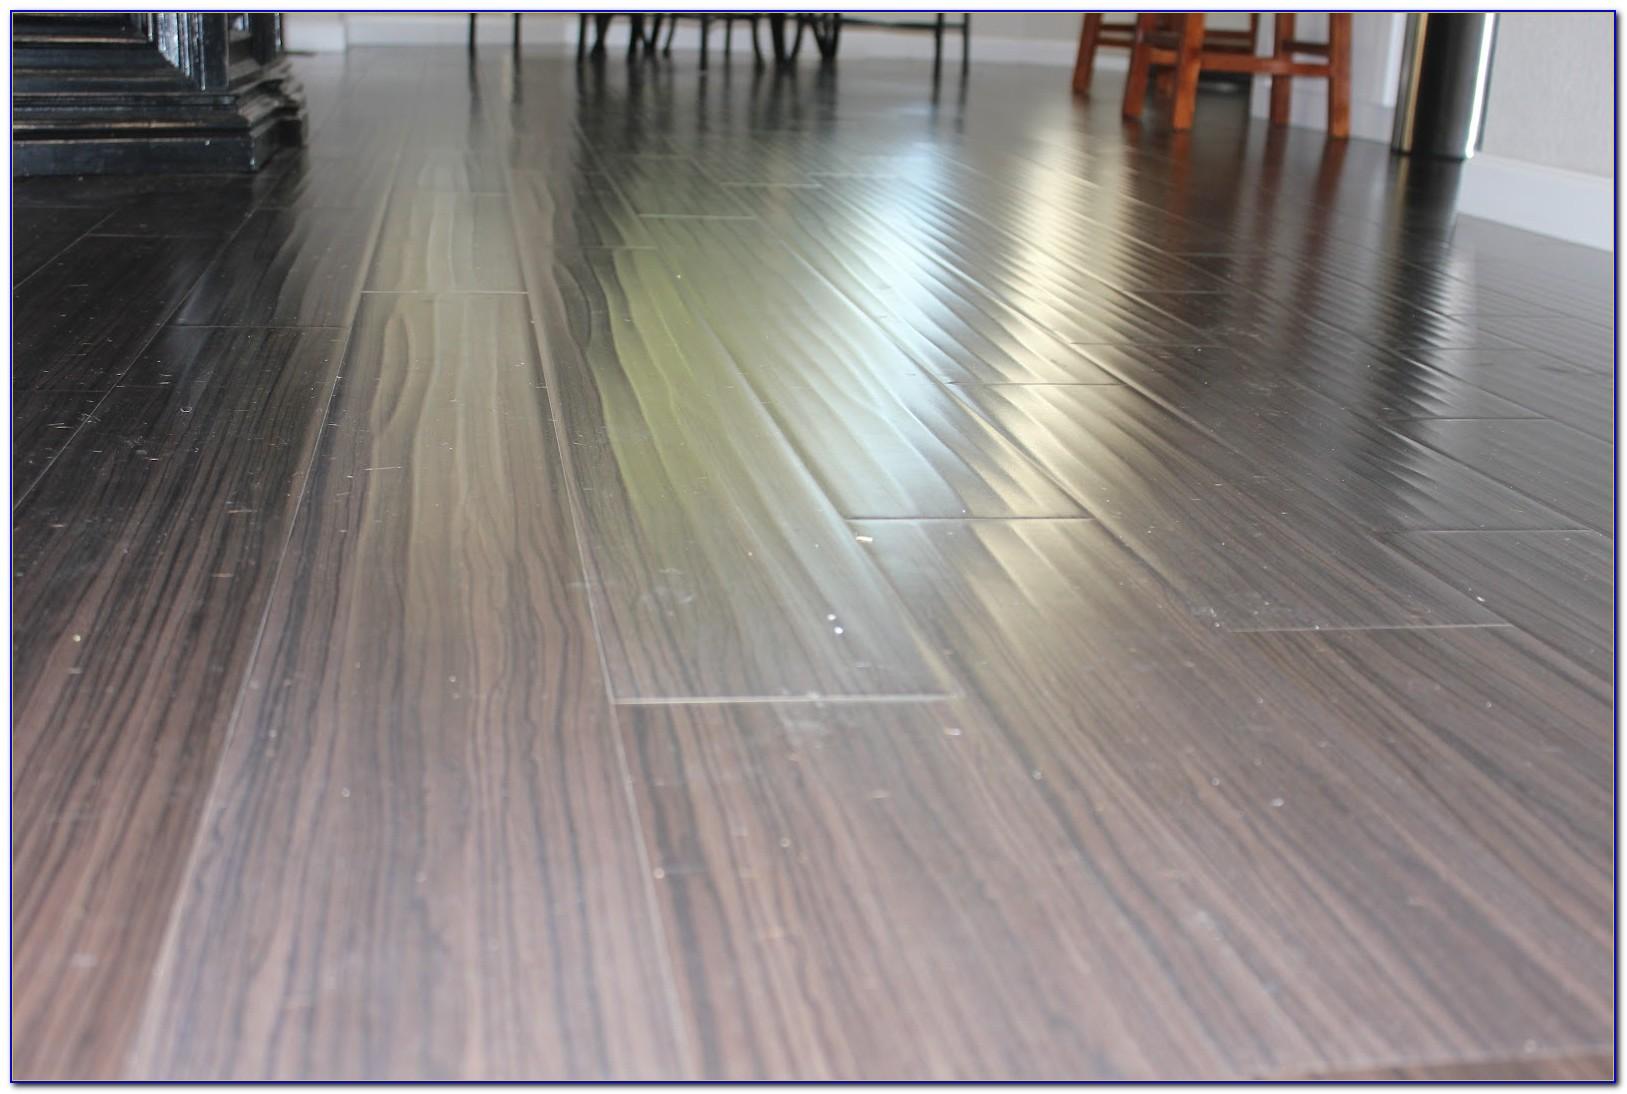 the best laminate flooring underlayment flooring home design ideas ojn3m251qx90260. Black Bedroom Furniture Sets. Home Design Ideas